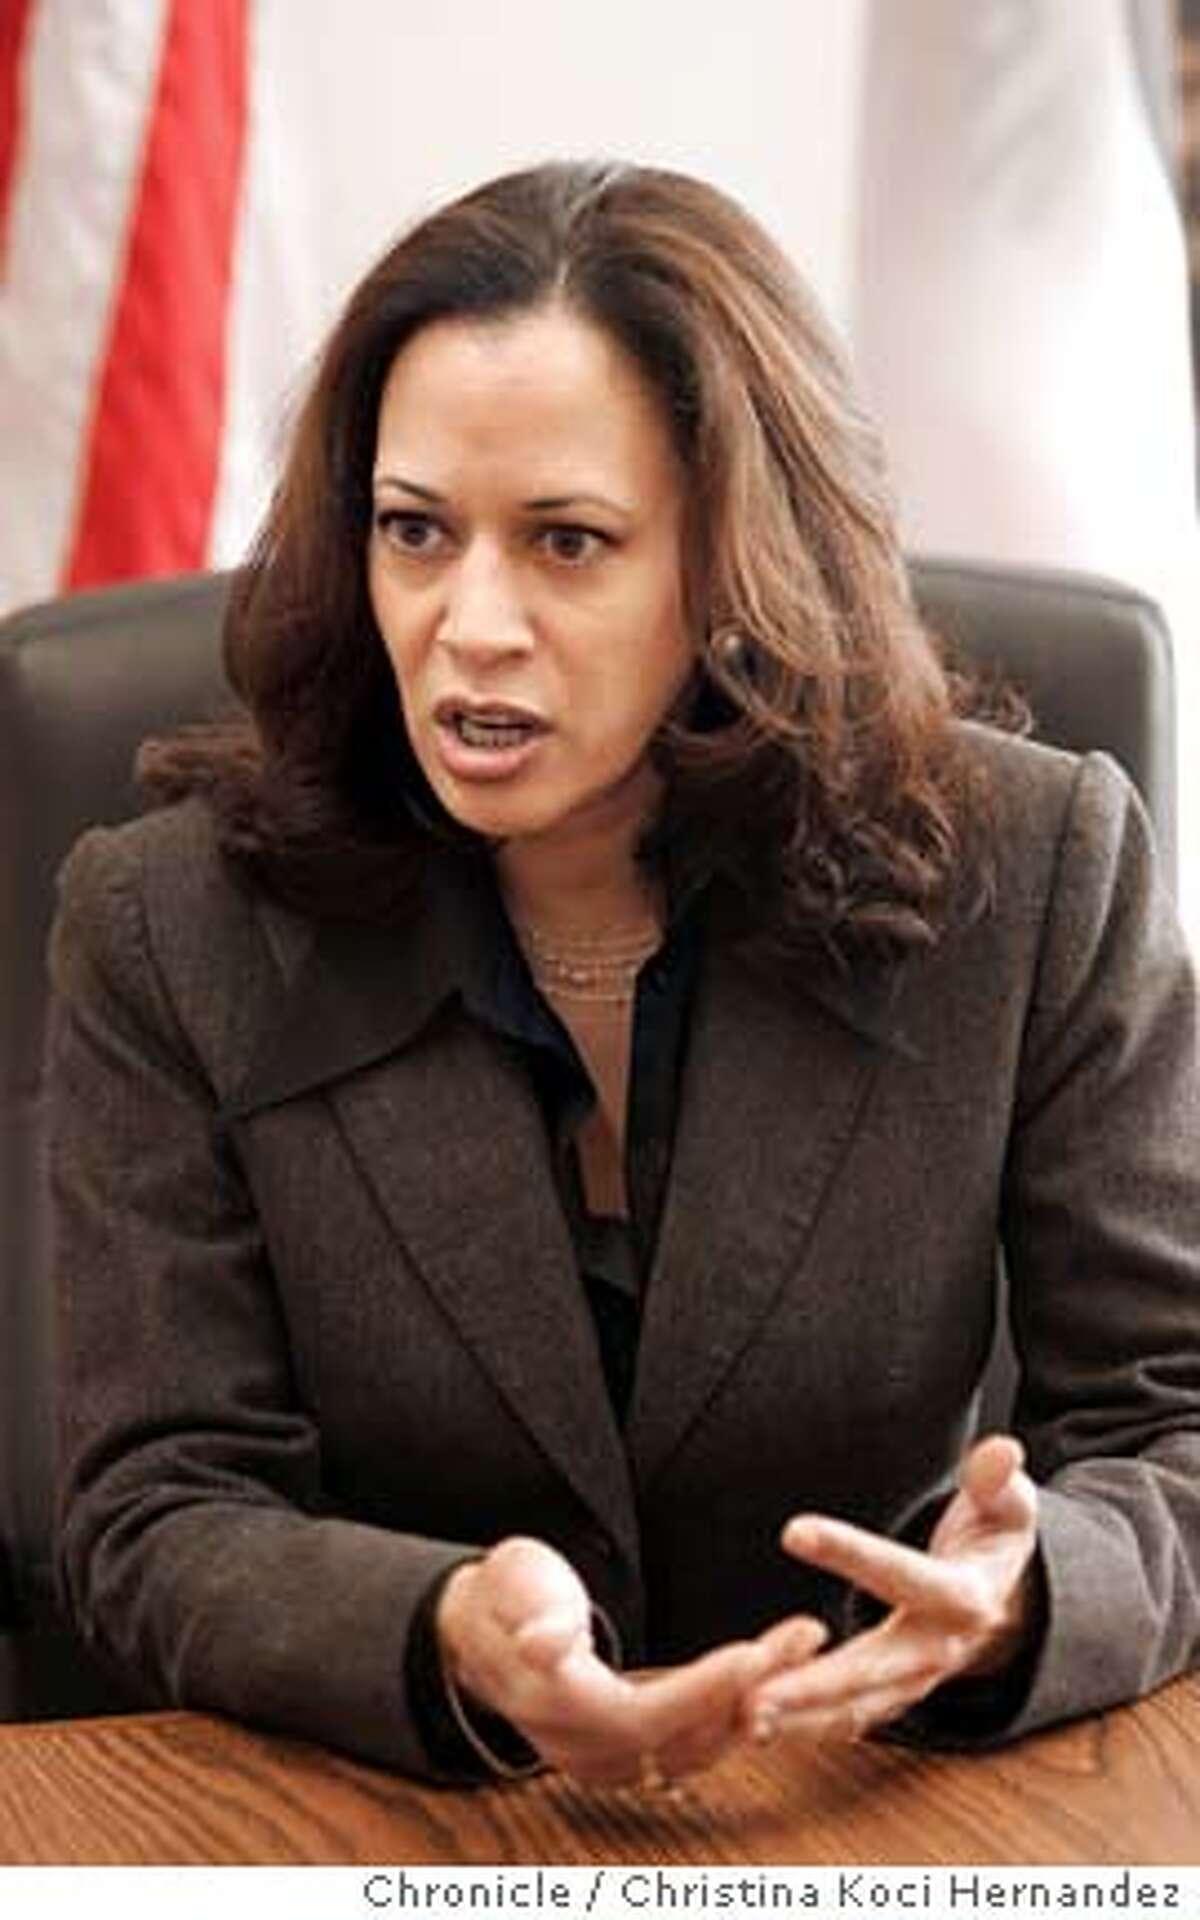 CHRISTINA KOCI HERNANDEZ/CHRONICLE We're doing a two year anniversary story on SF District Attorney Kamala Harris.